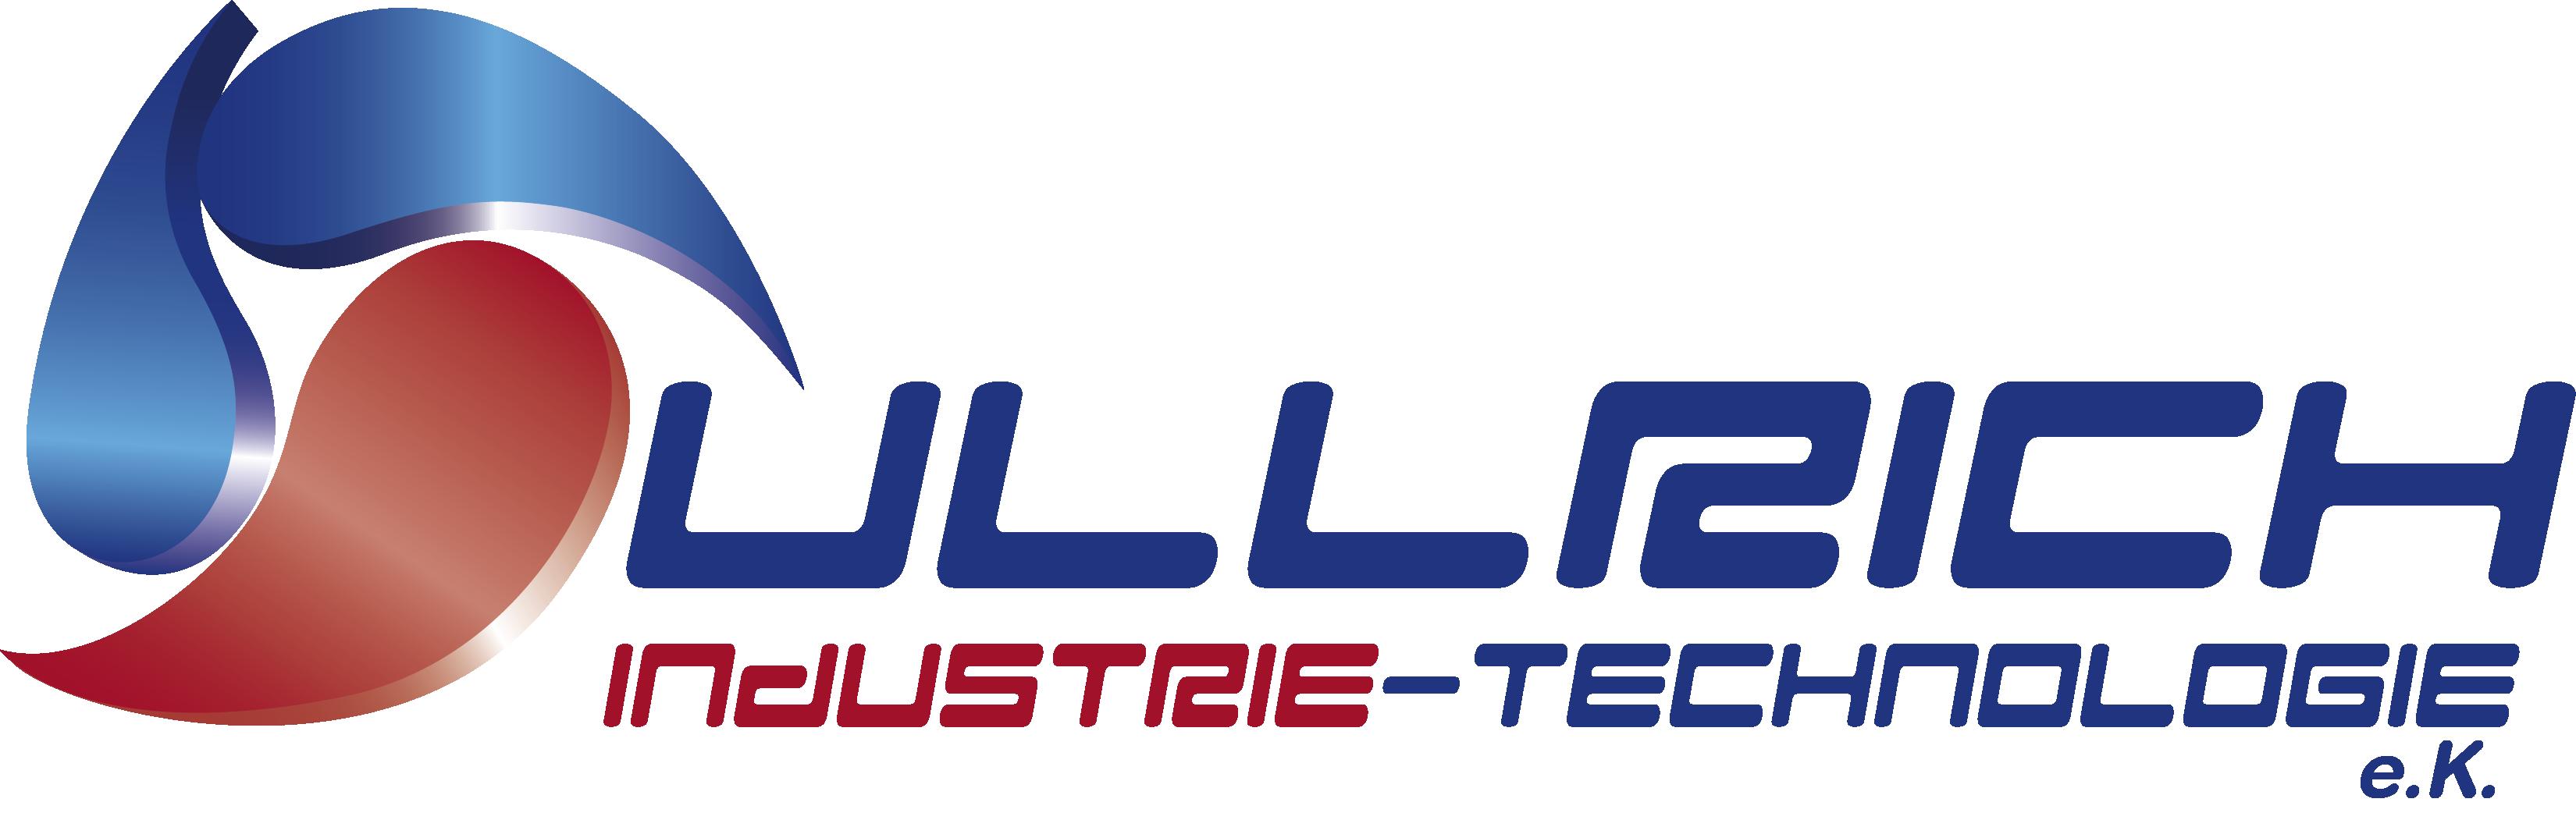 Ullrich Industrie-Technologie